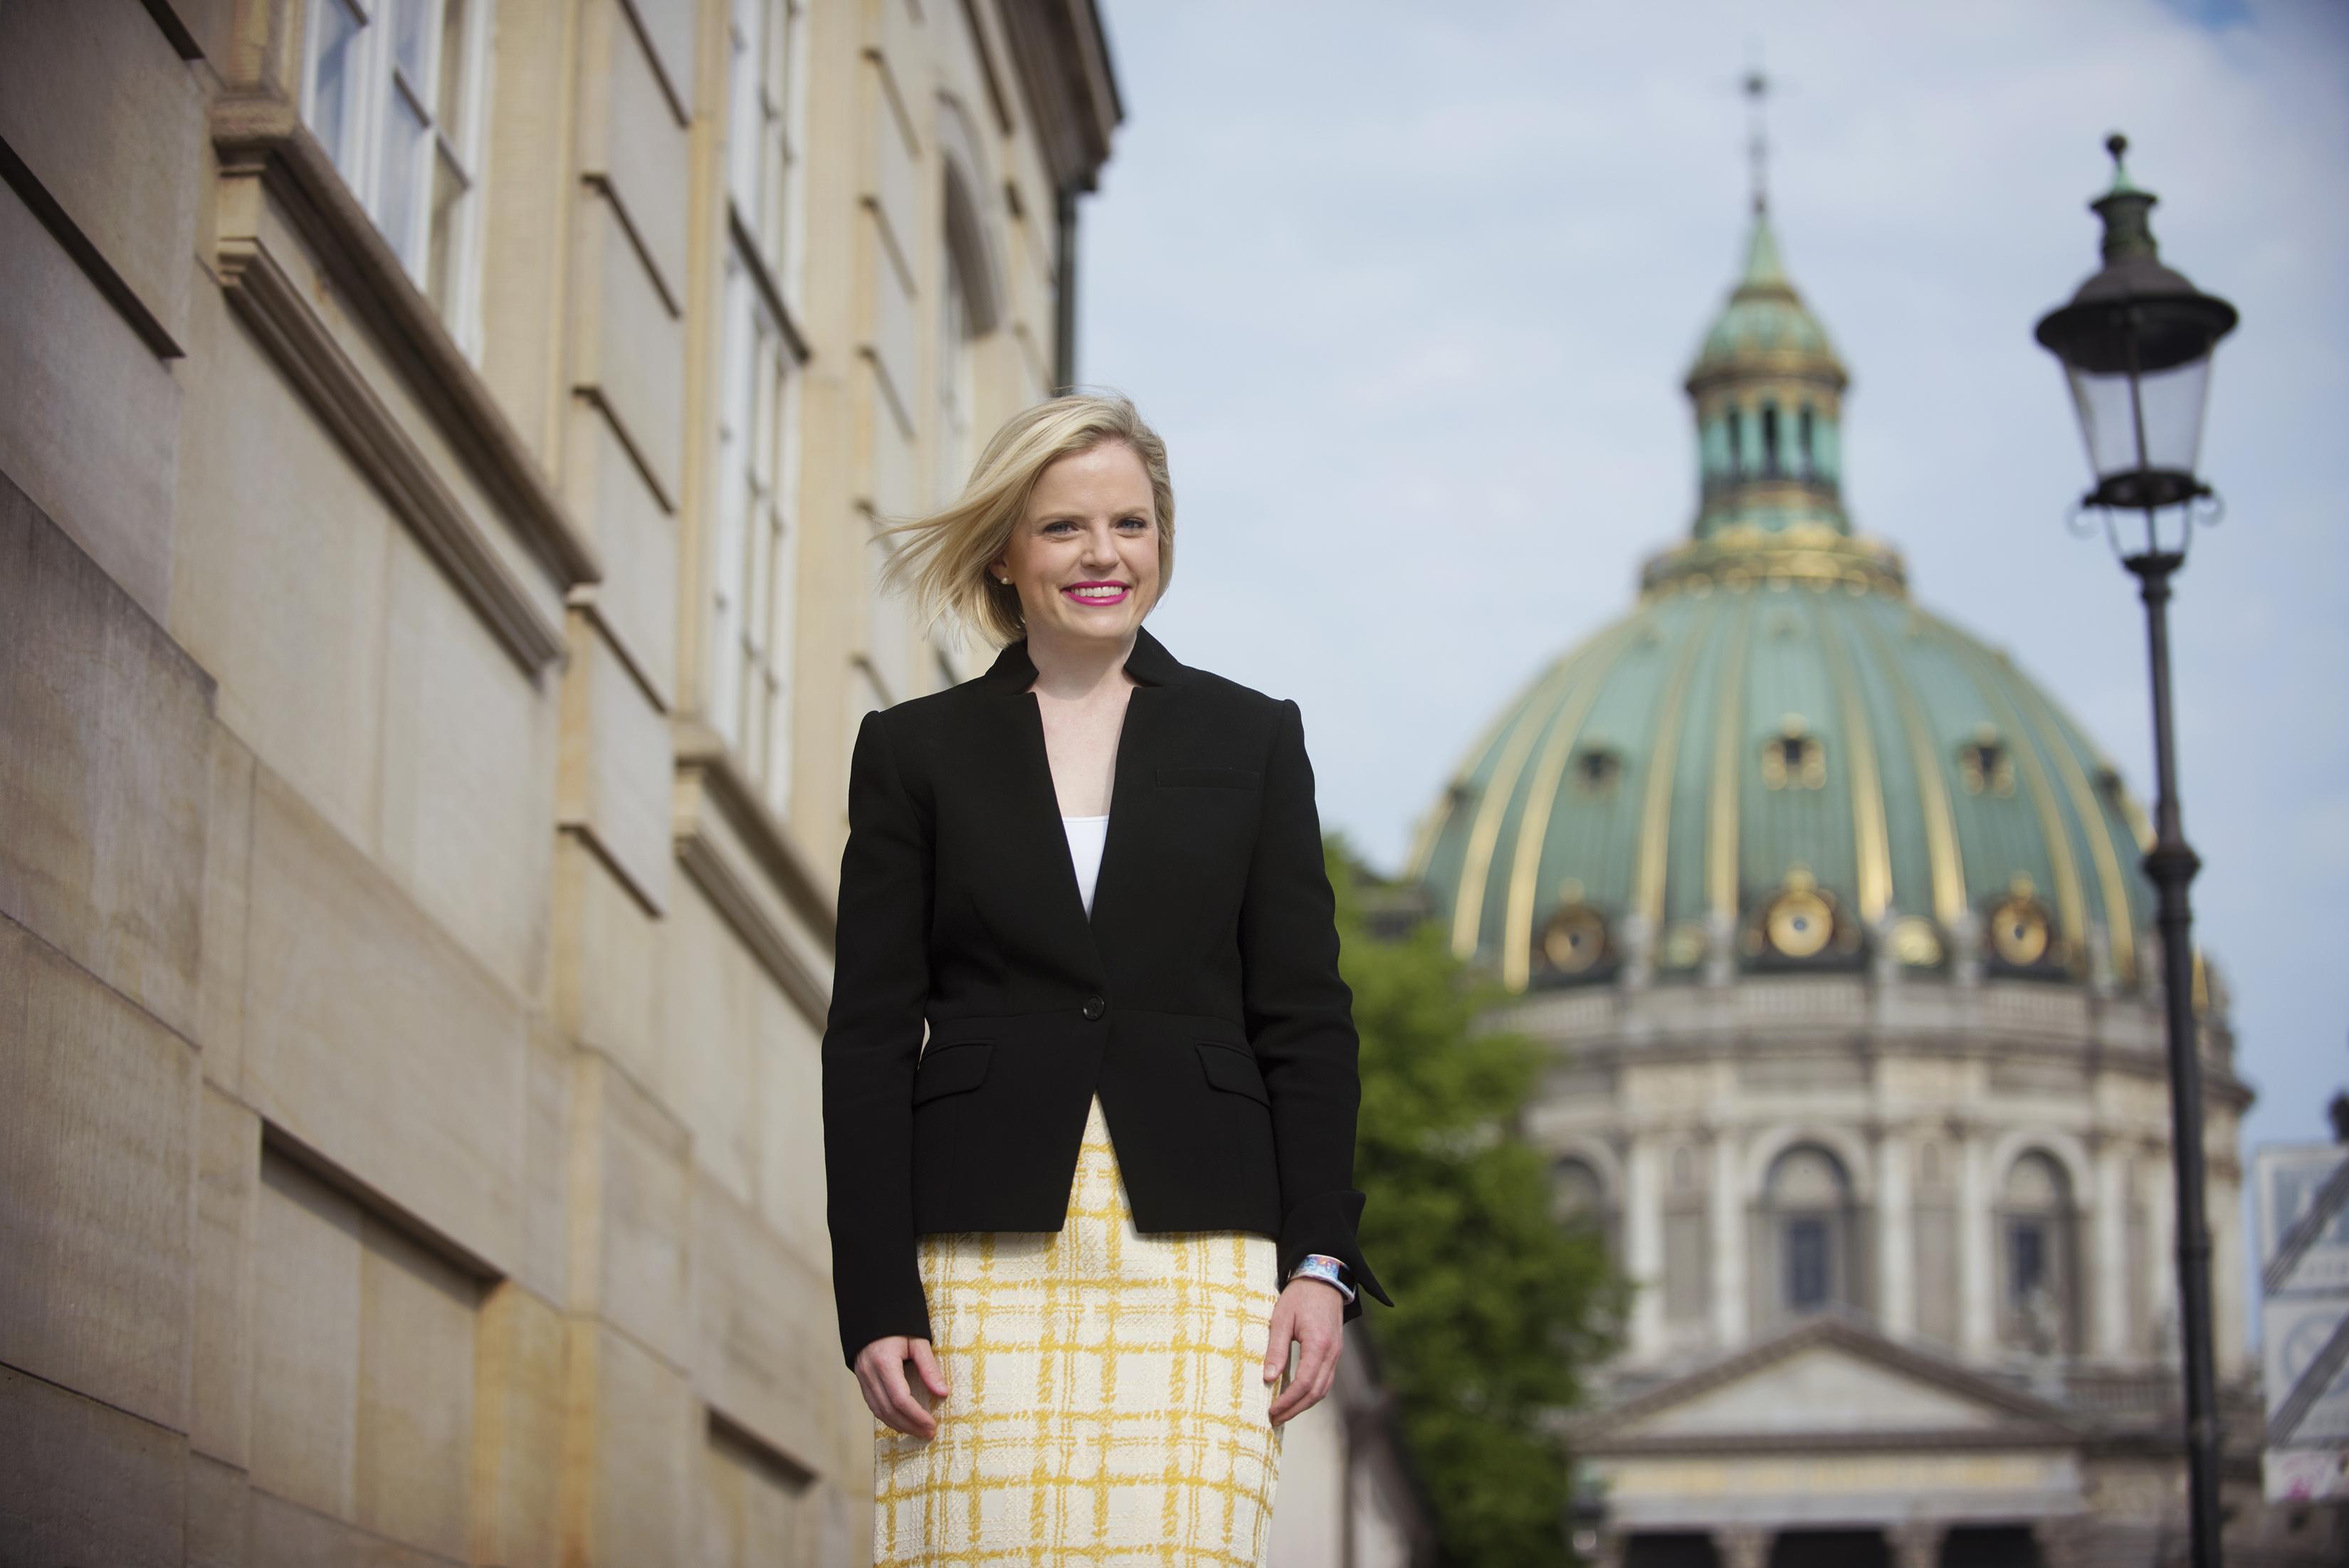 Jennifer Klos in Copenhagen. Photographed by Flytographer